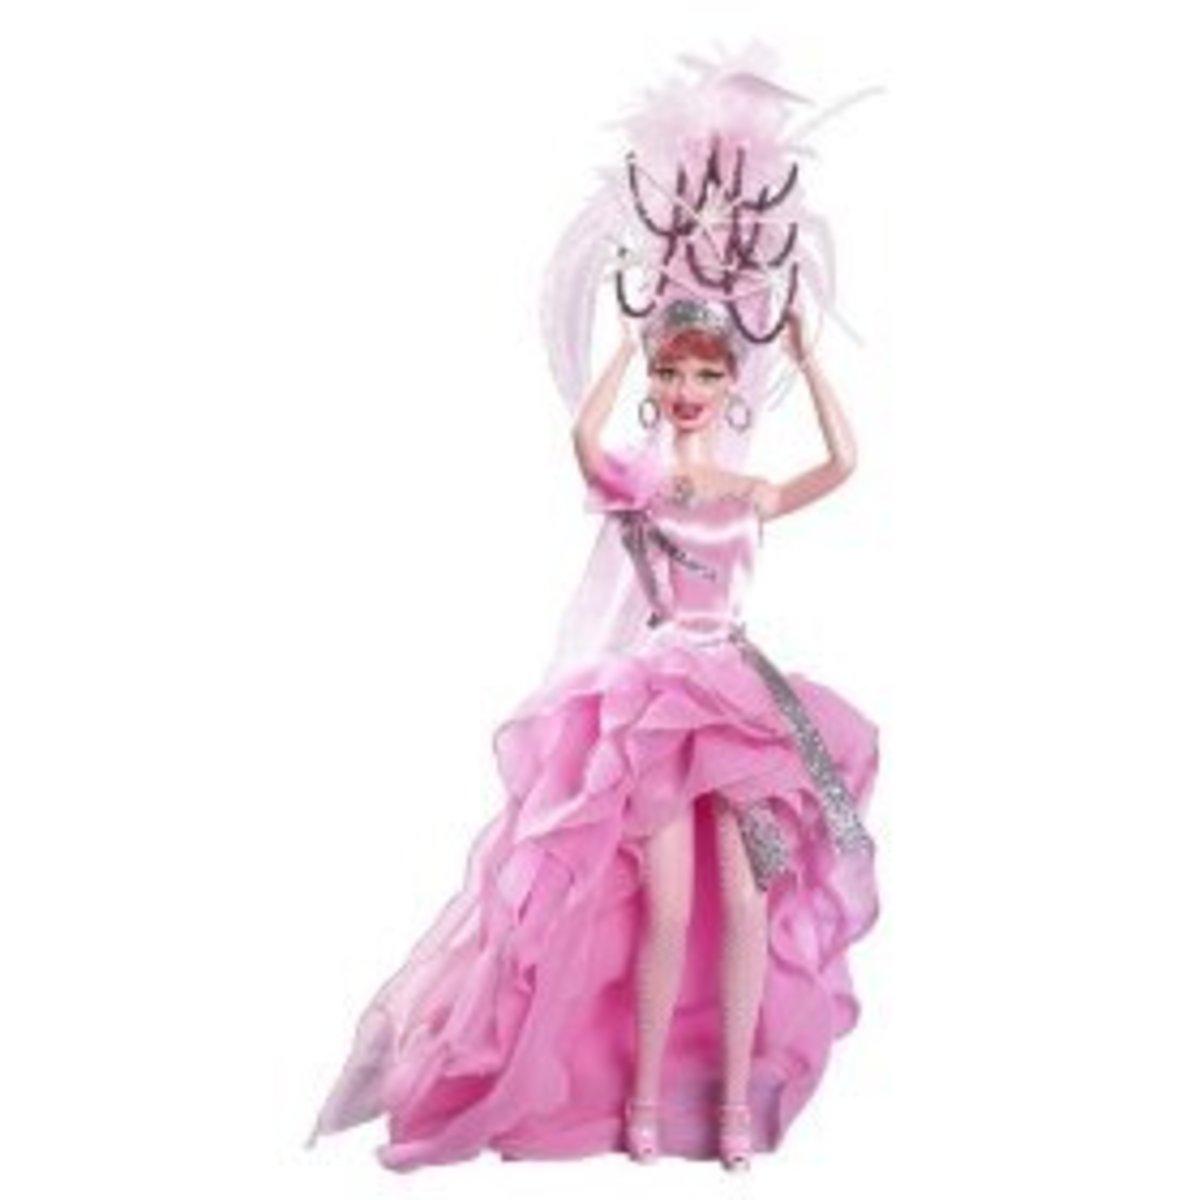 I Love Lucy Celebrity Barbie Doll